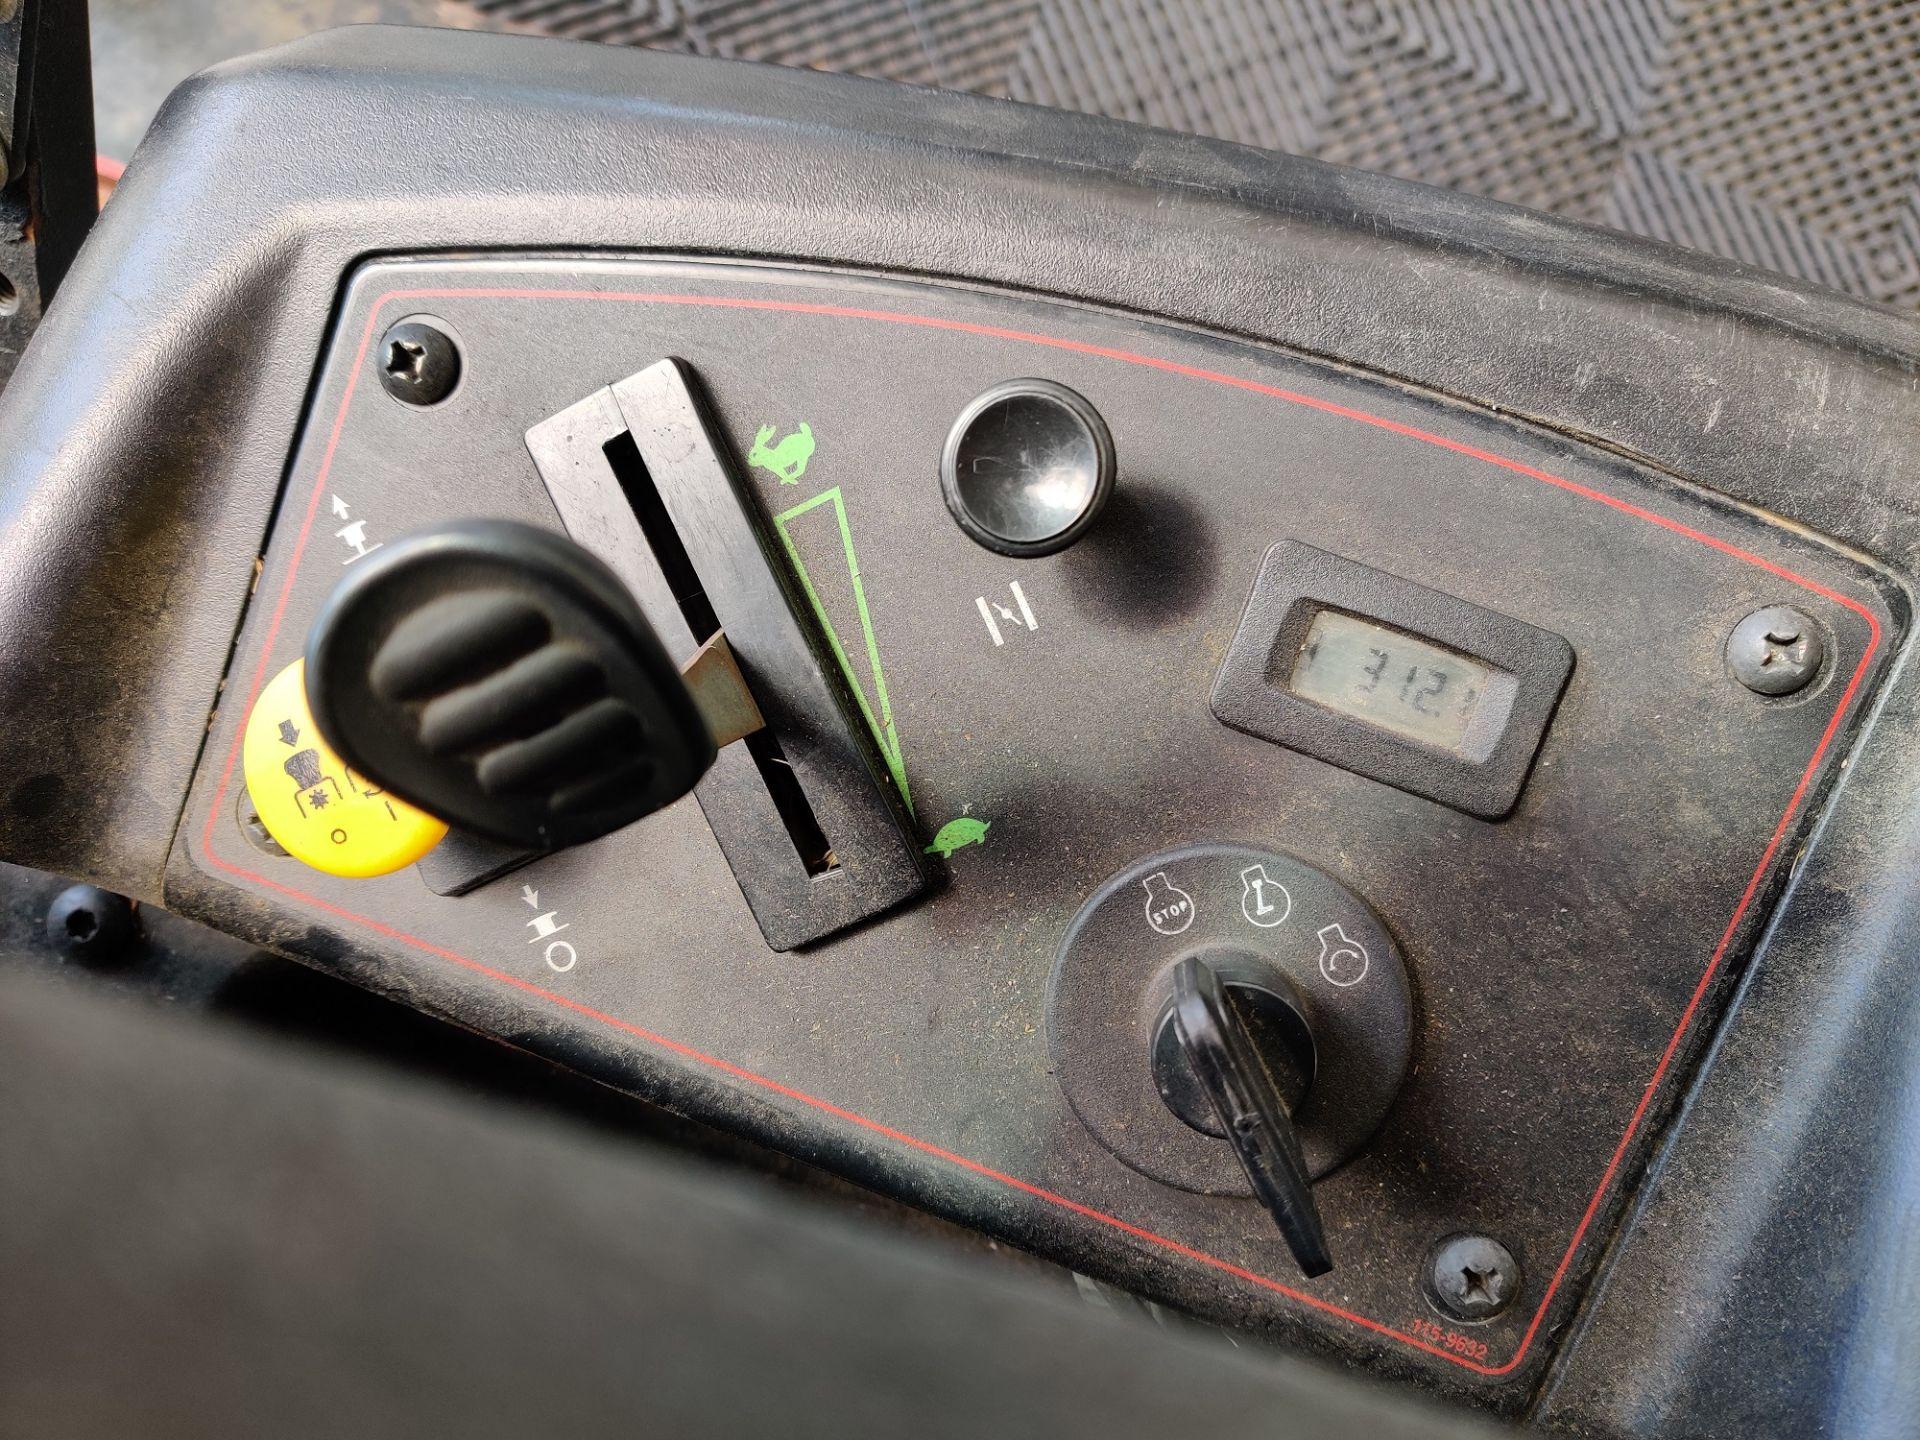 "Lot 51 - 2013 TORO TITAN 5420 RIDE ON ZERO TURN 54"" CUT KAWASAKI ENGINE LAWN MOWER, LOW HOURS *PLUS VAT*"